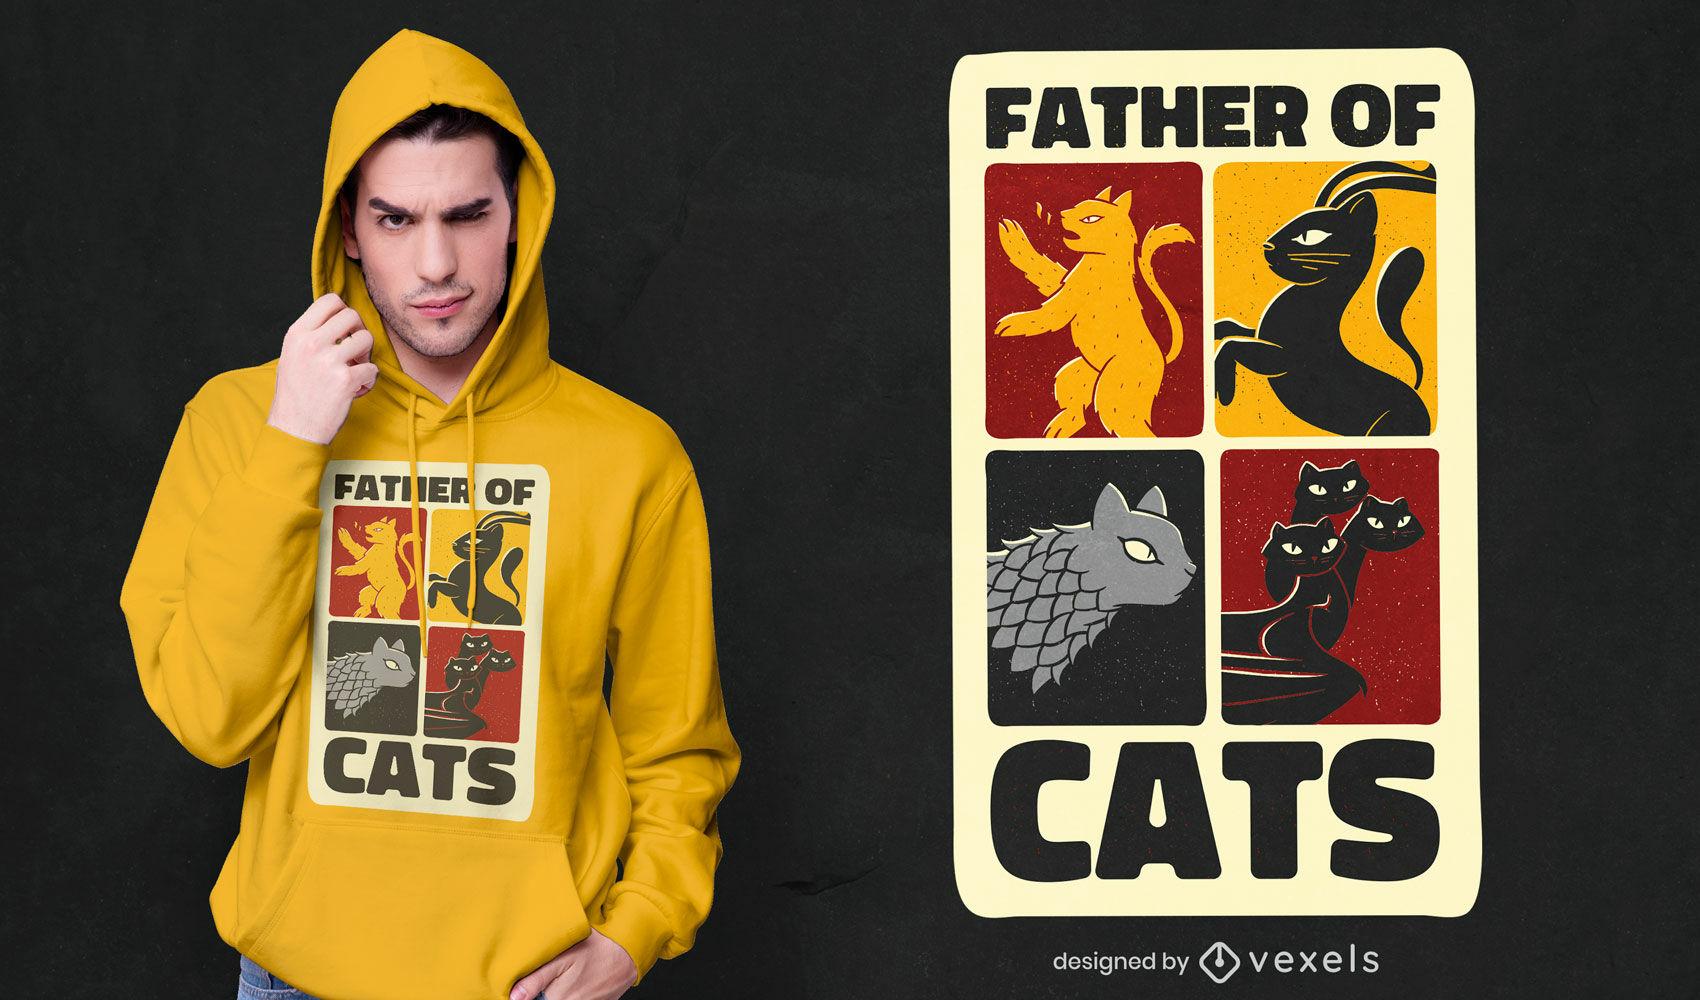 Diseño de camiseta de padre de gatos.